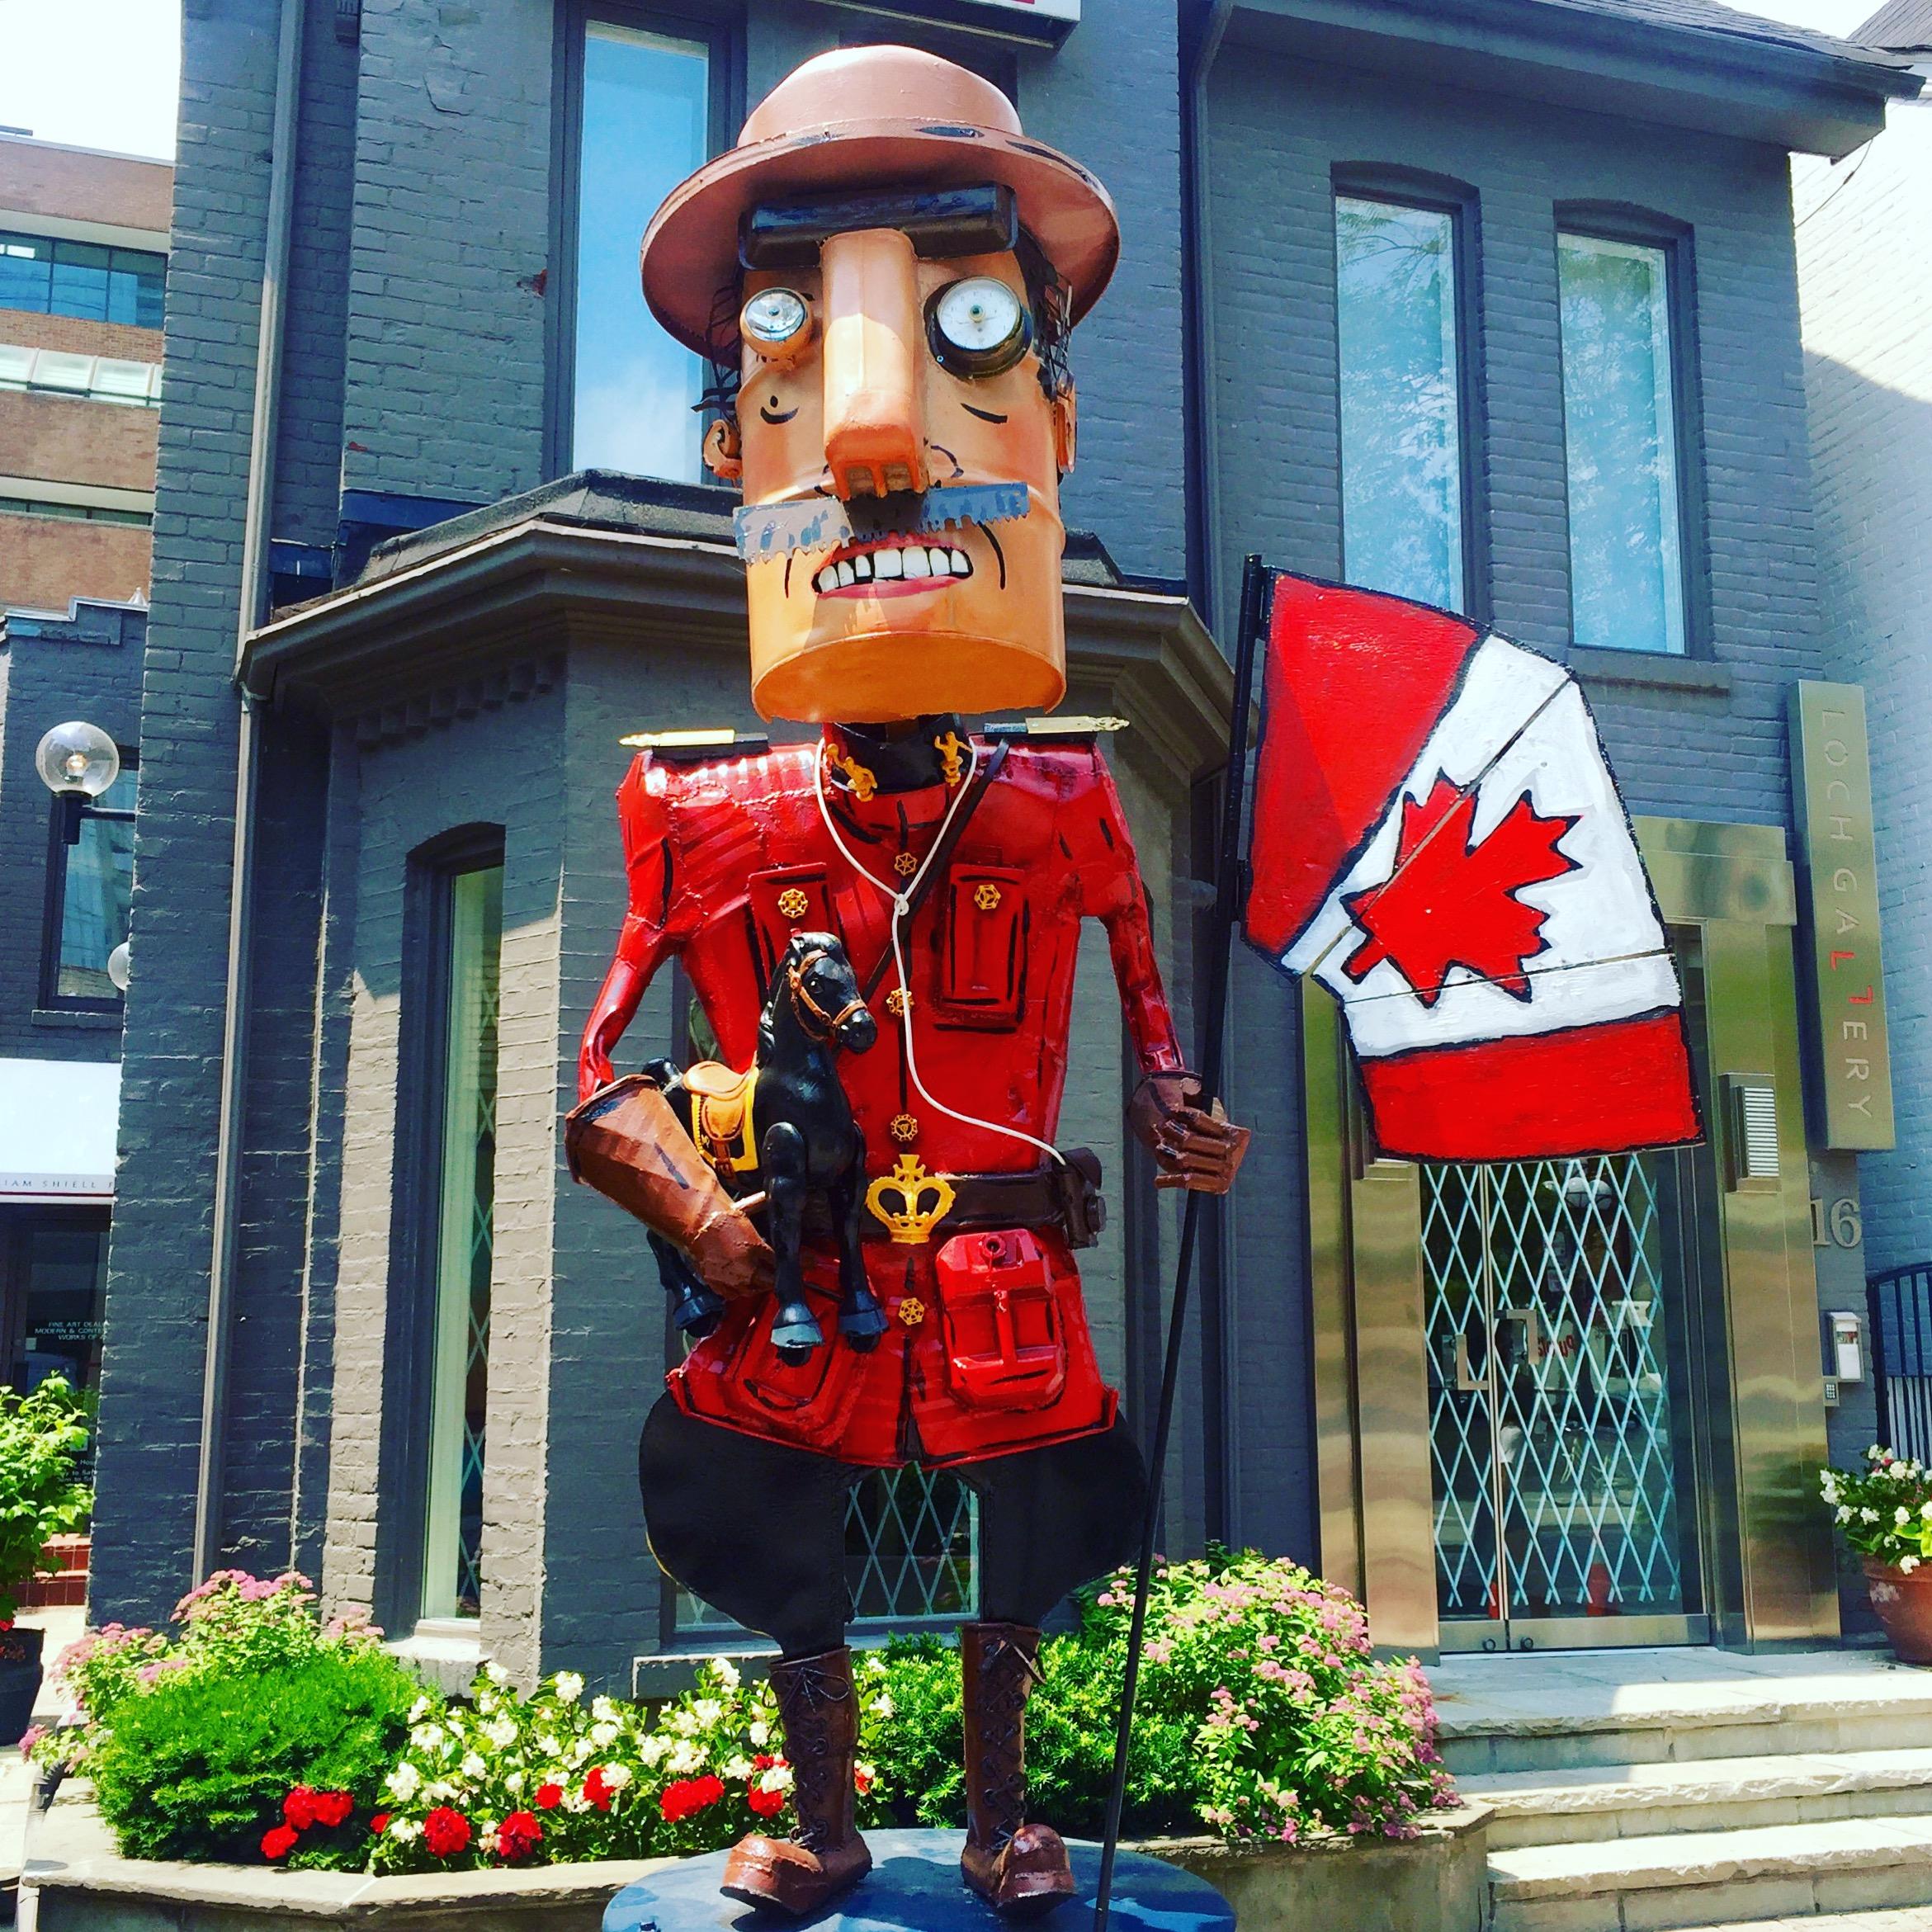 Toronto, ON, Canada, June 2016